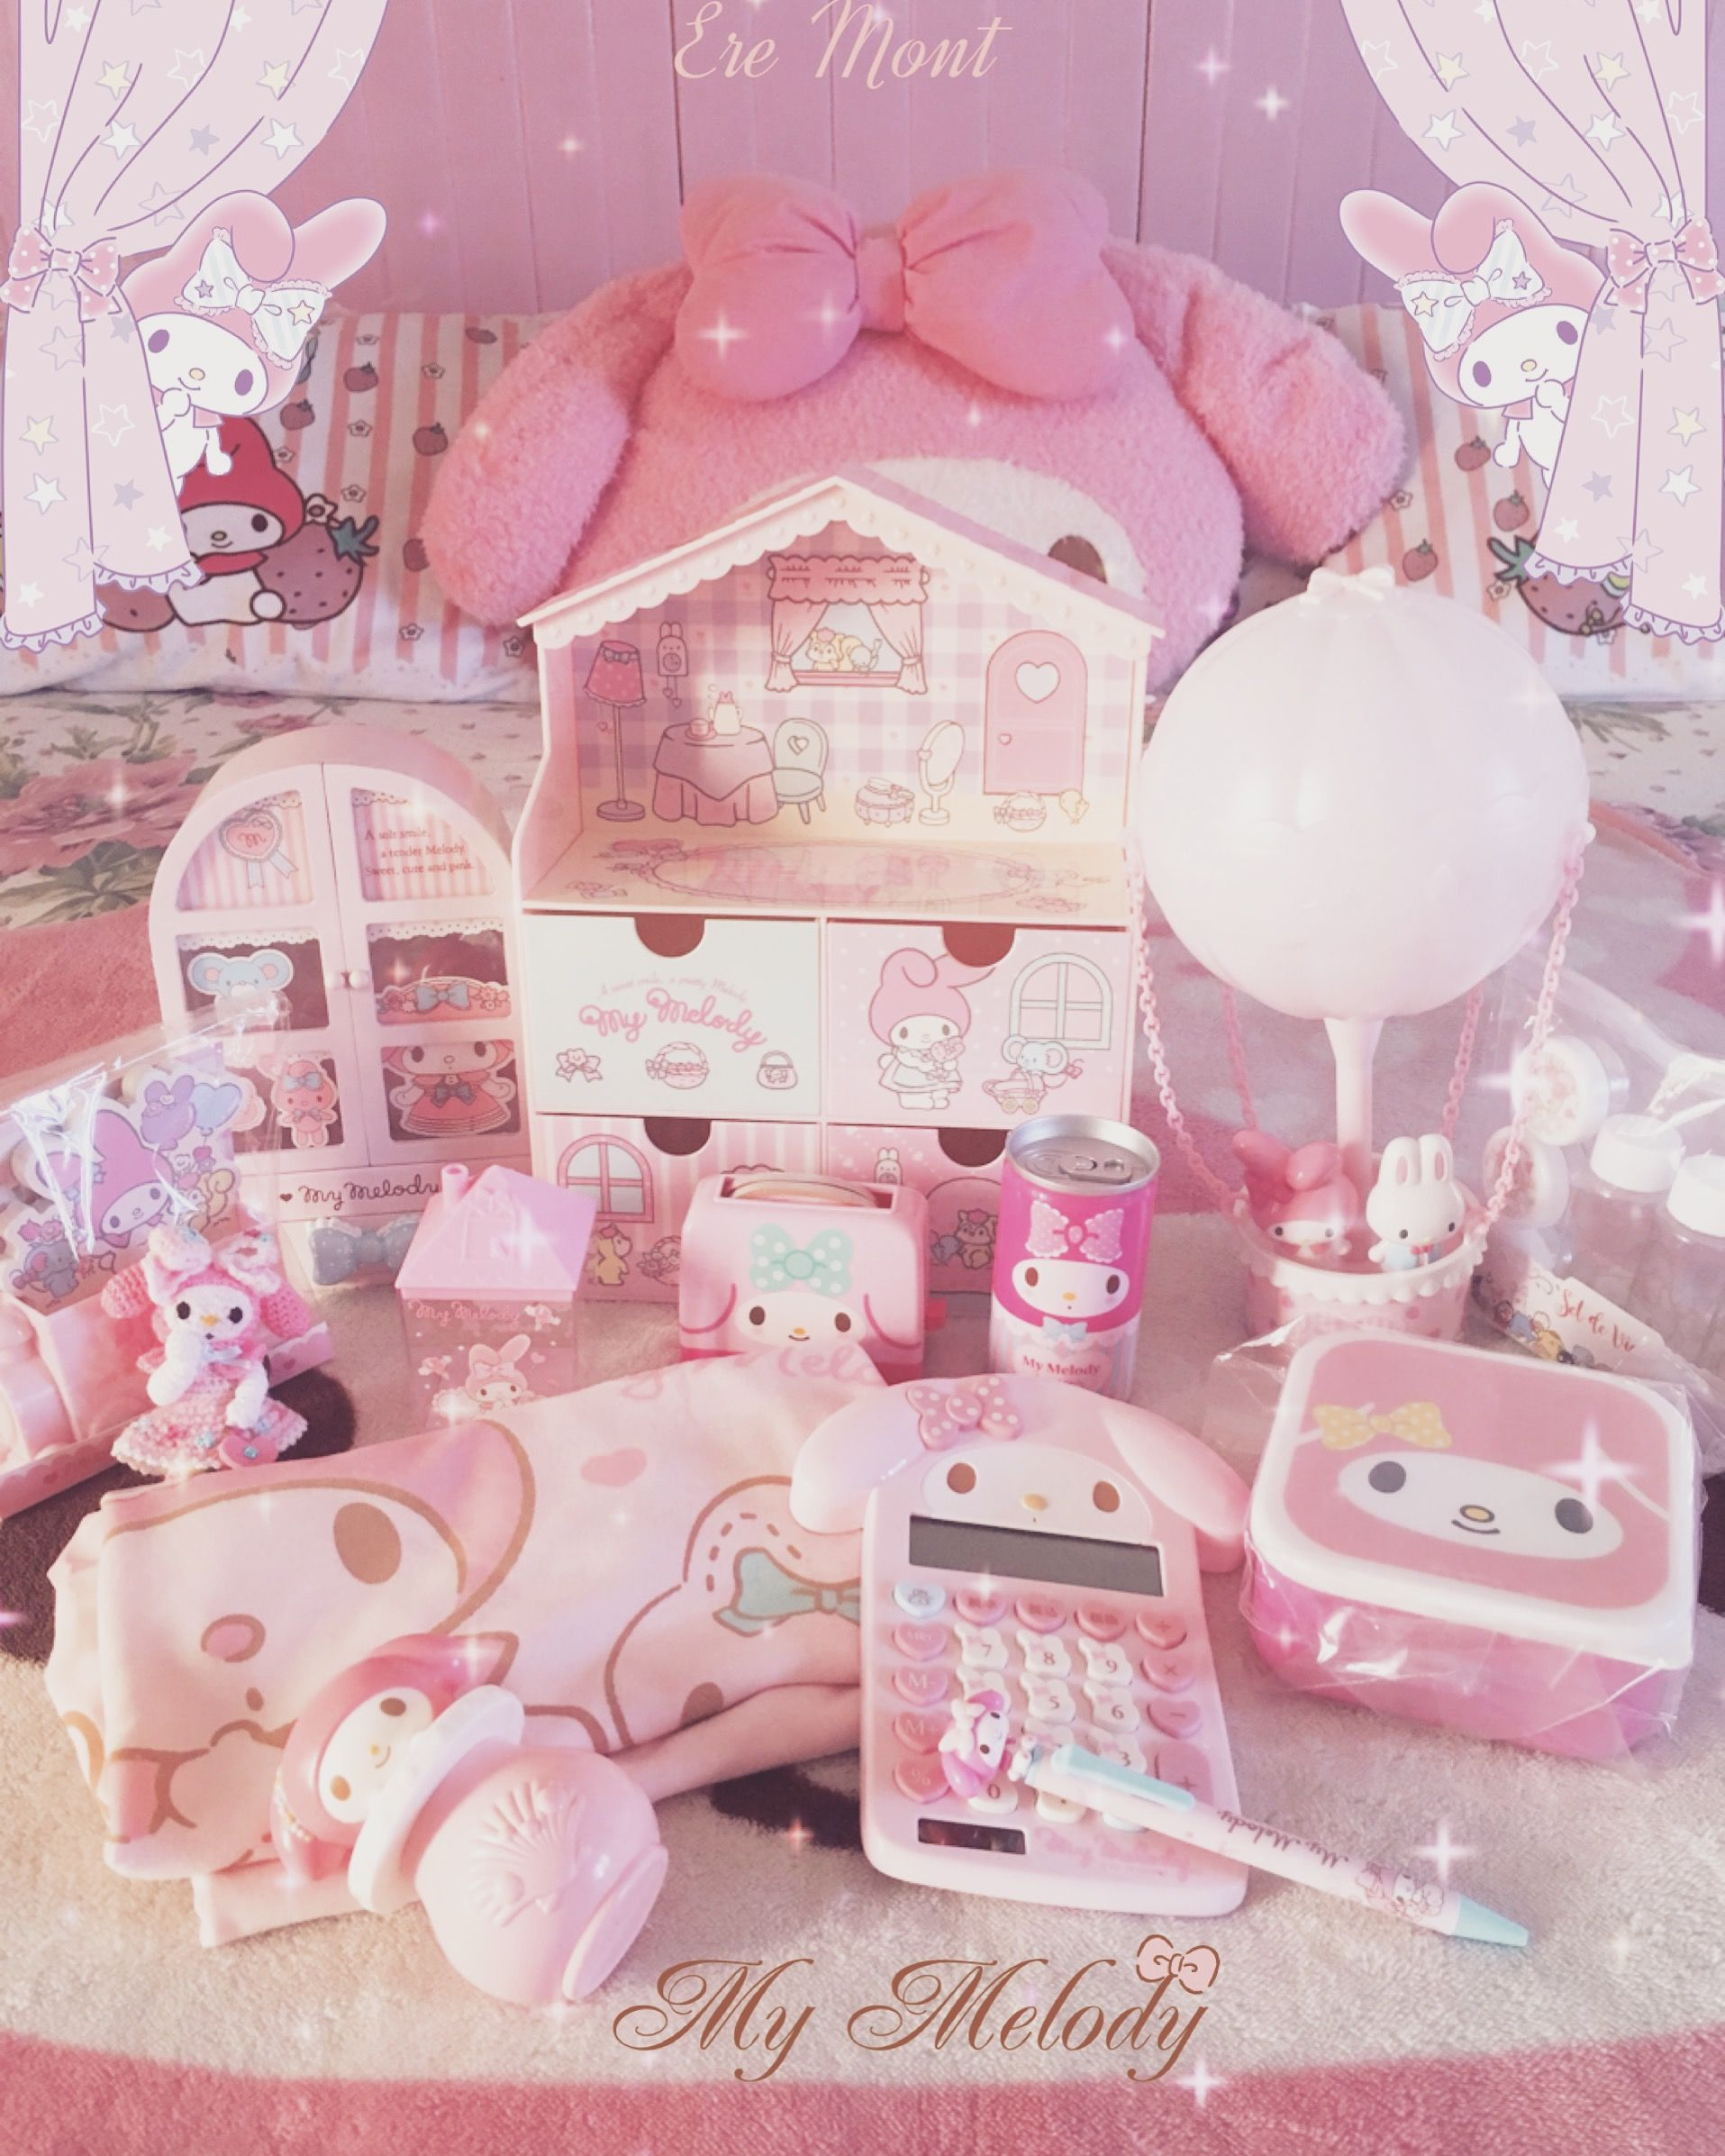 Mis Compritas Kawaii Room Baby Pink Aesthetic Cute Bedroom Decor